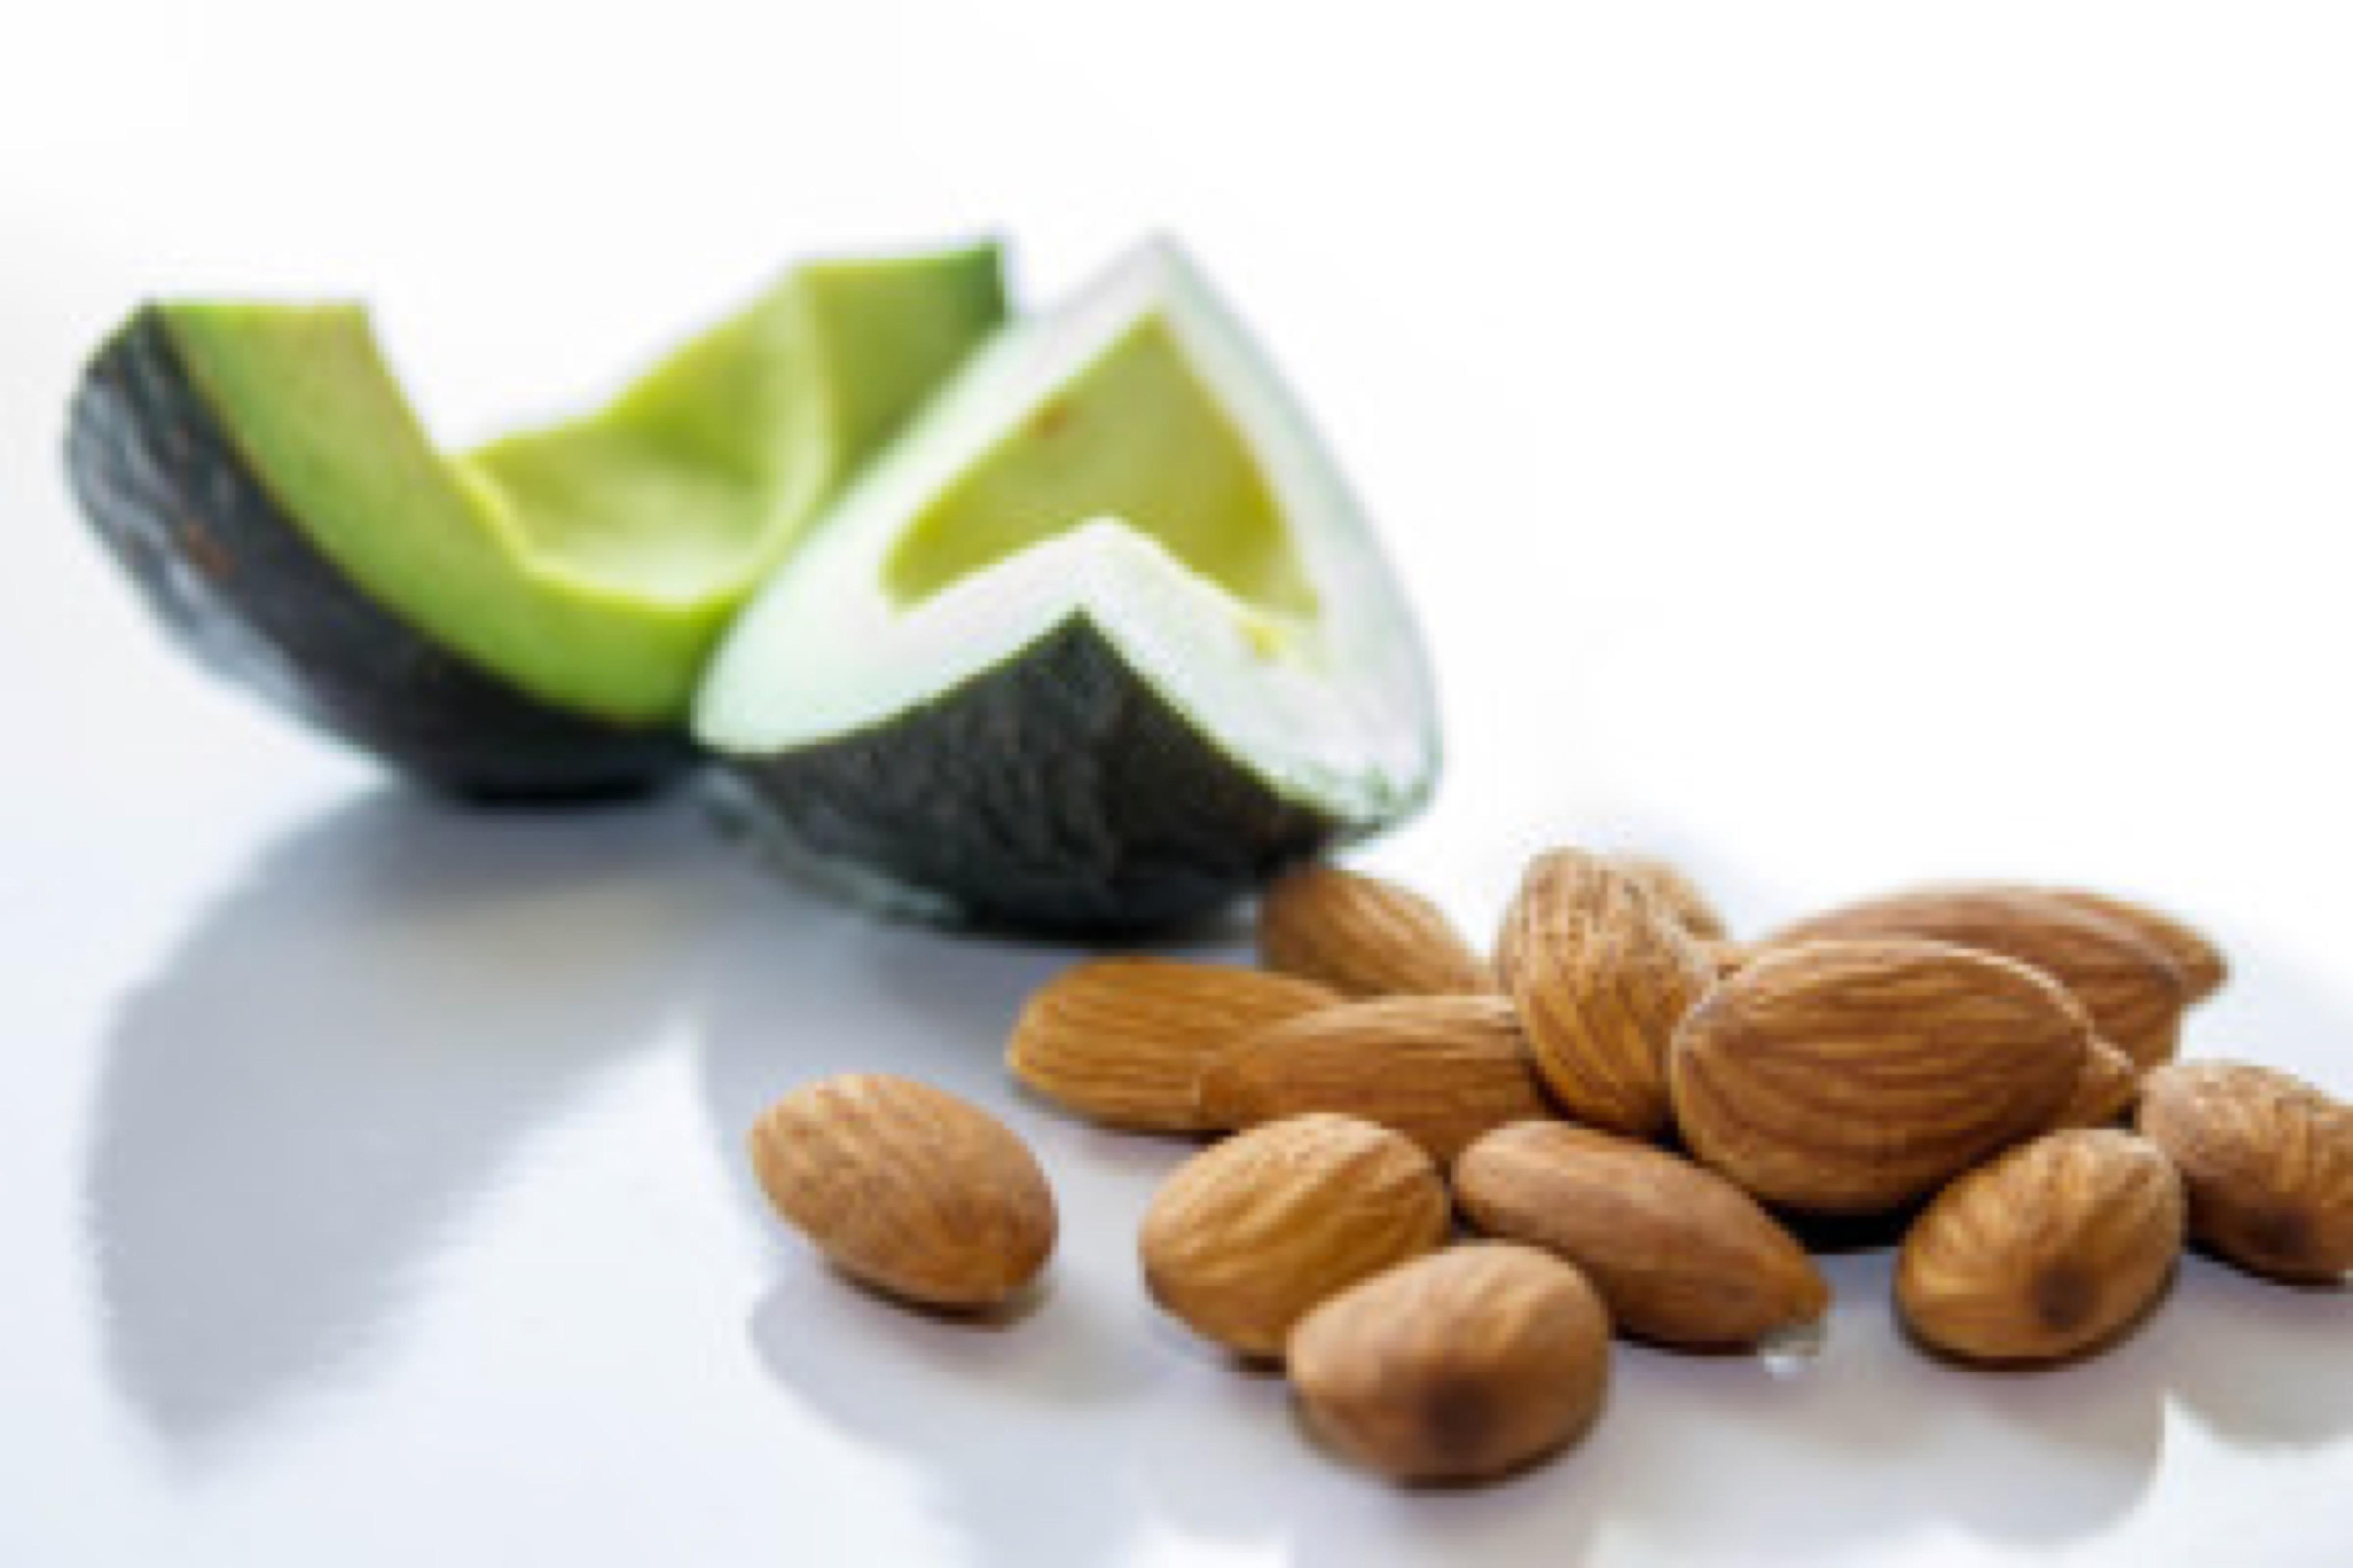 Almonds and avocado slices